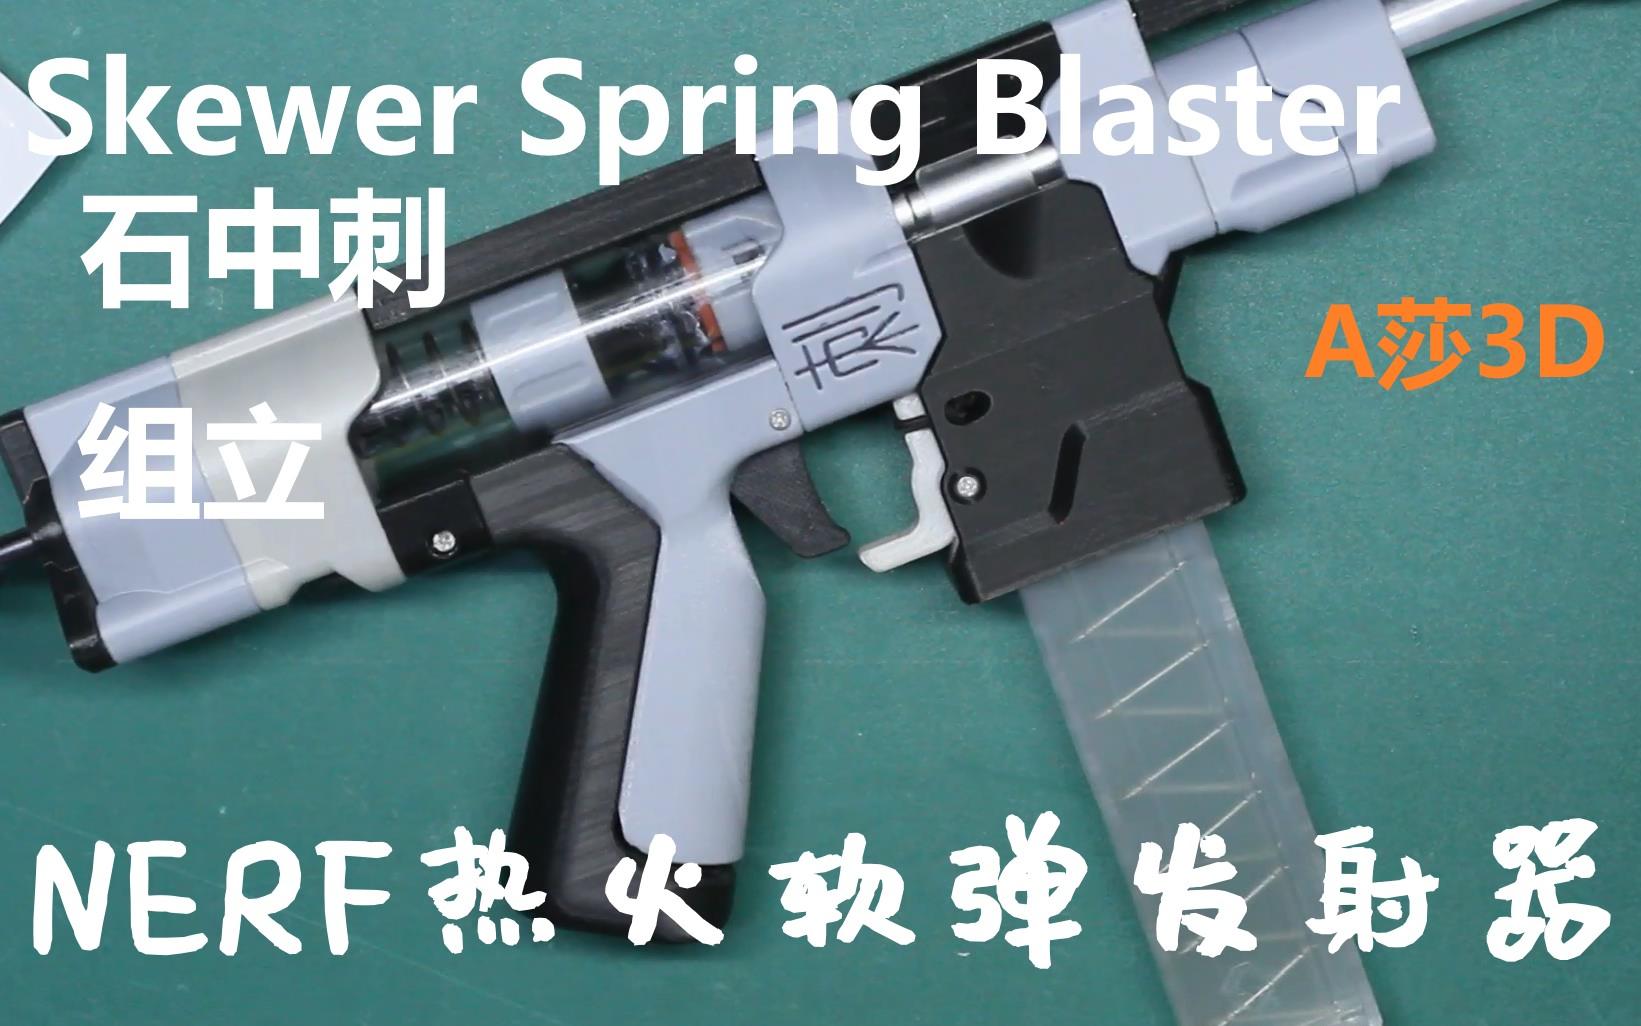 Skewer石中刺组立【A莎3D 打印NERF热火软弹发射器】